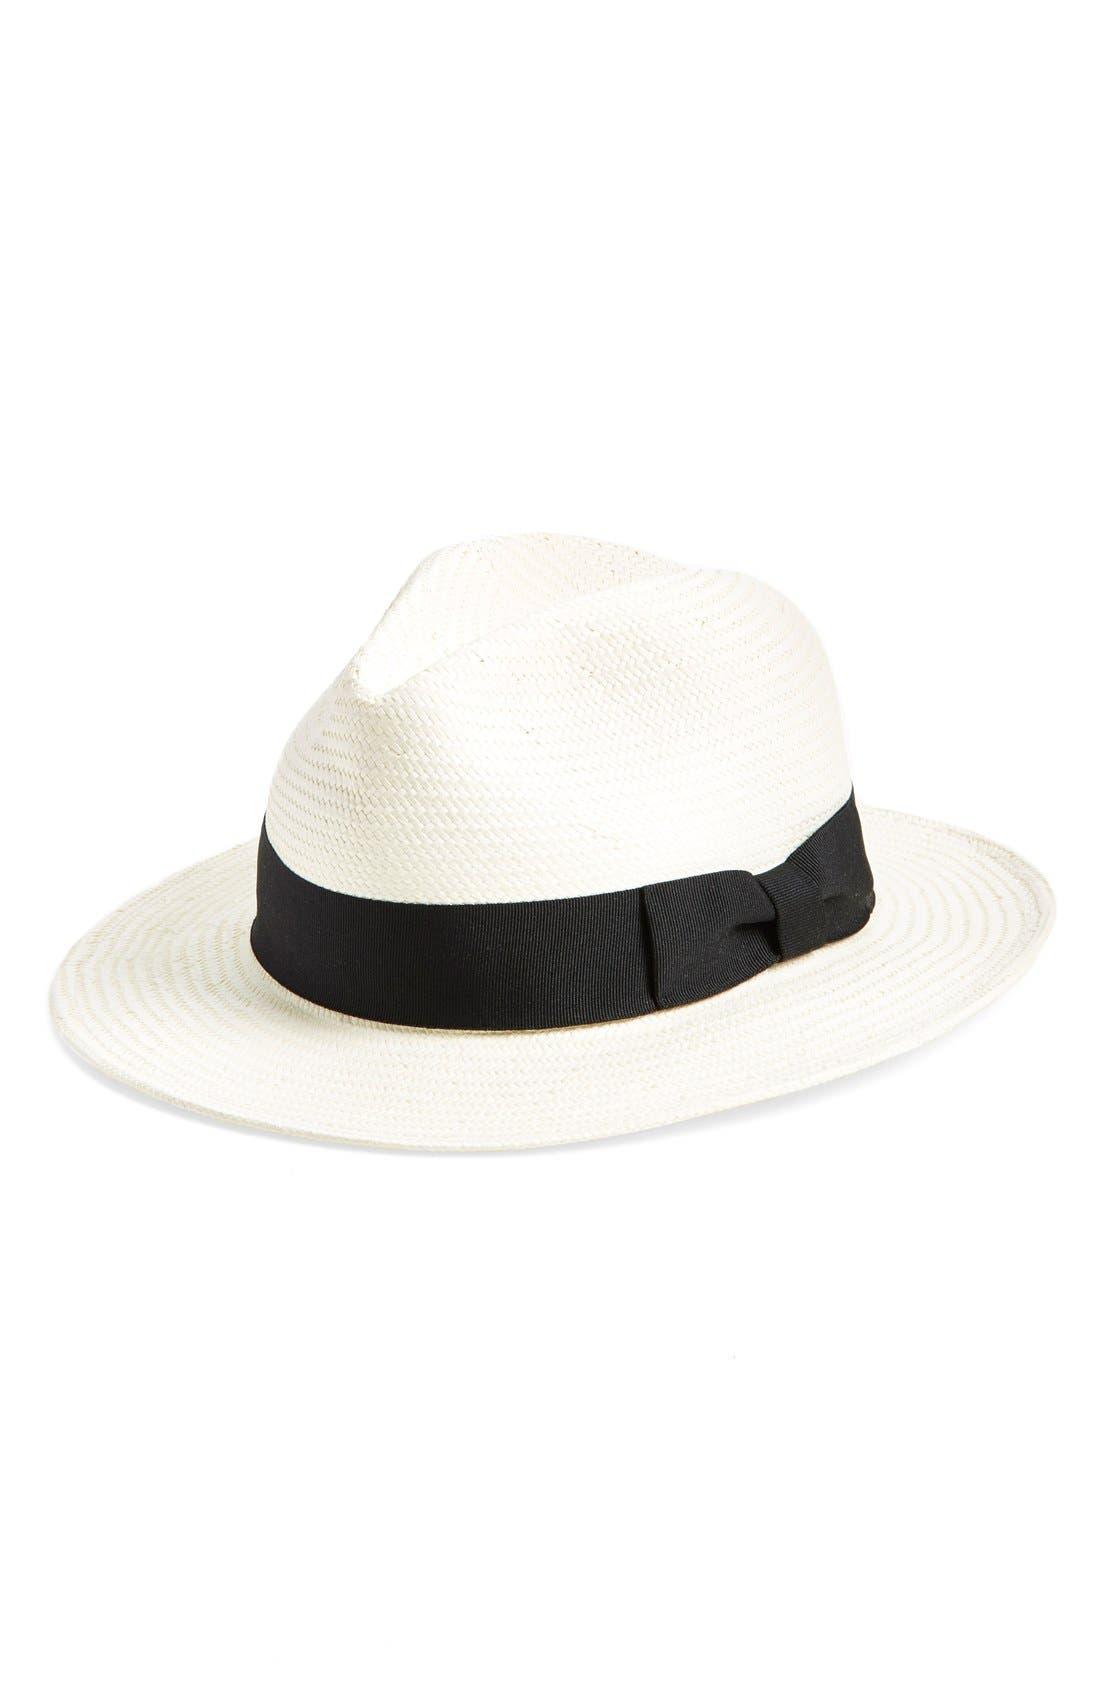 Alternate Image 1 Selected - Madewell Panama Hat